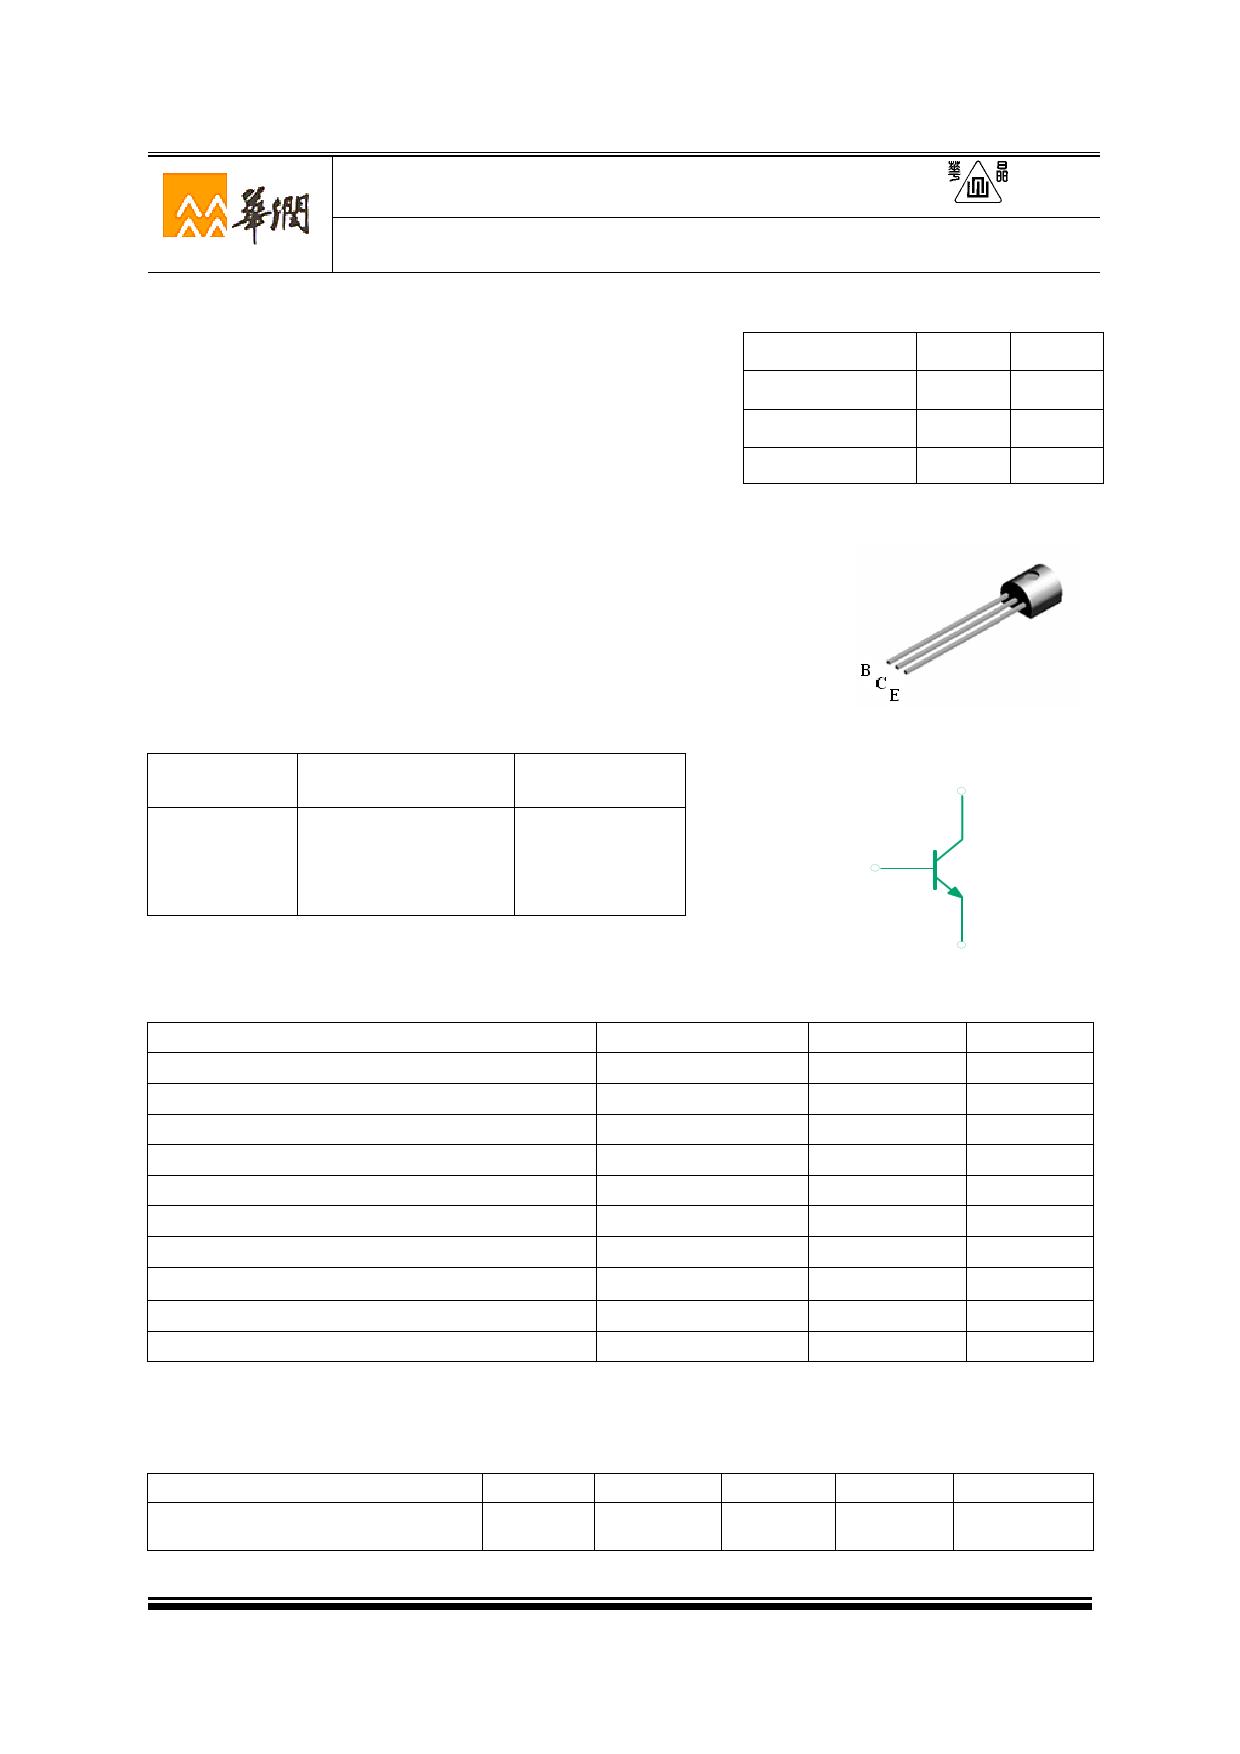 3DG2482HA1 Datasheet, 3DG2482HA1 PDF,ピン配置, 機能